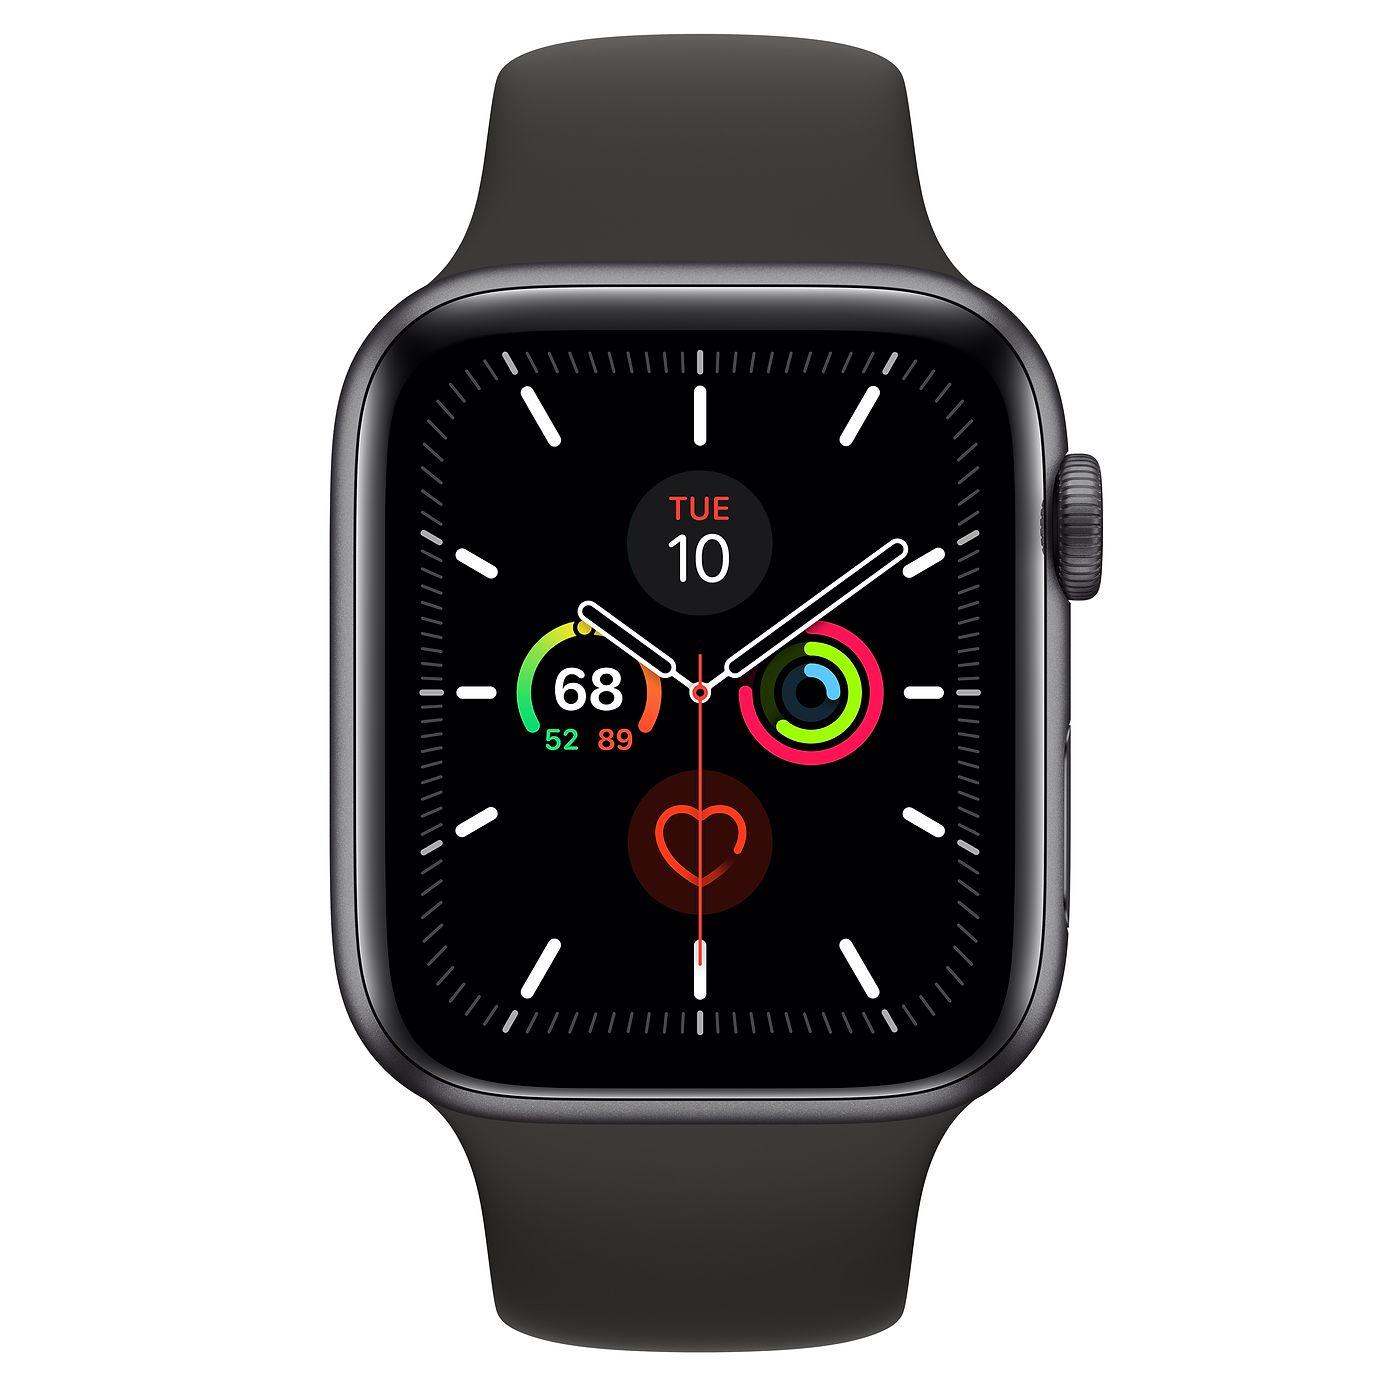 thumbnail 3 - Apple Watch Series 5 (GPS + Cellular) 44mm Smartwatch